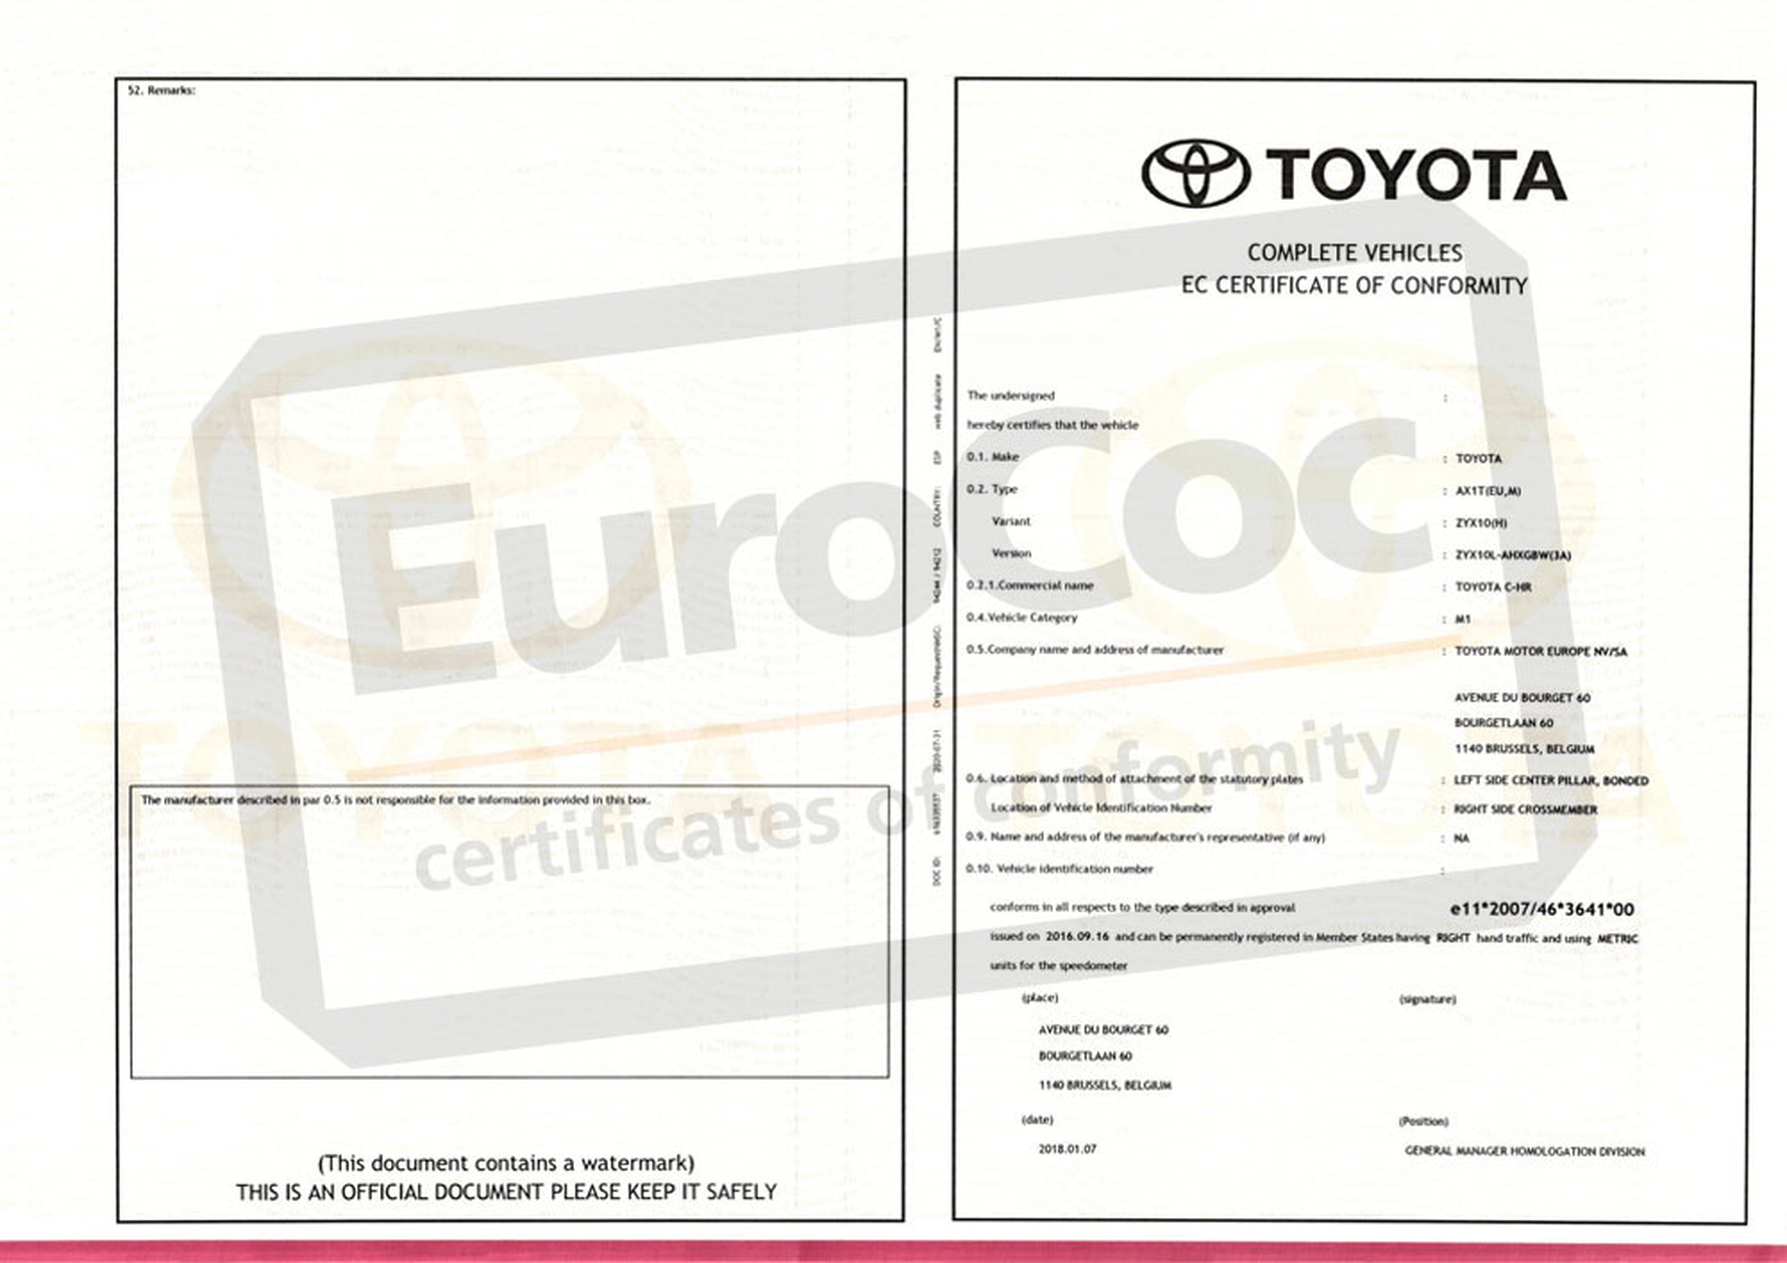 Toyota certificate of conformity